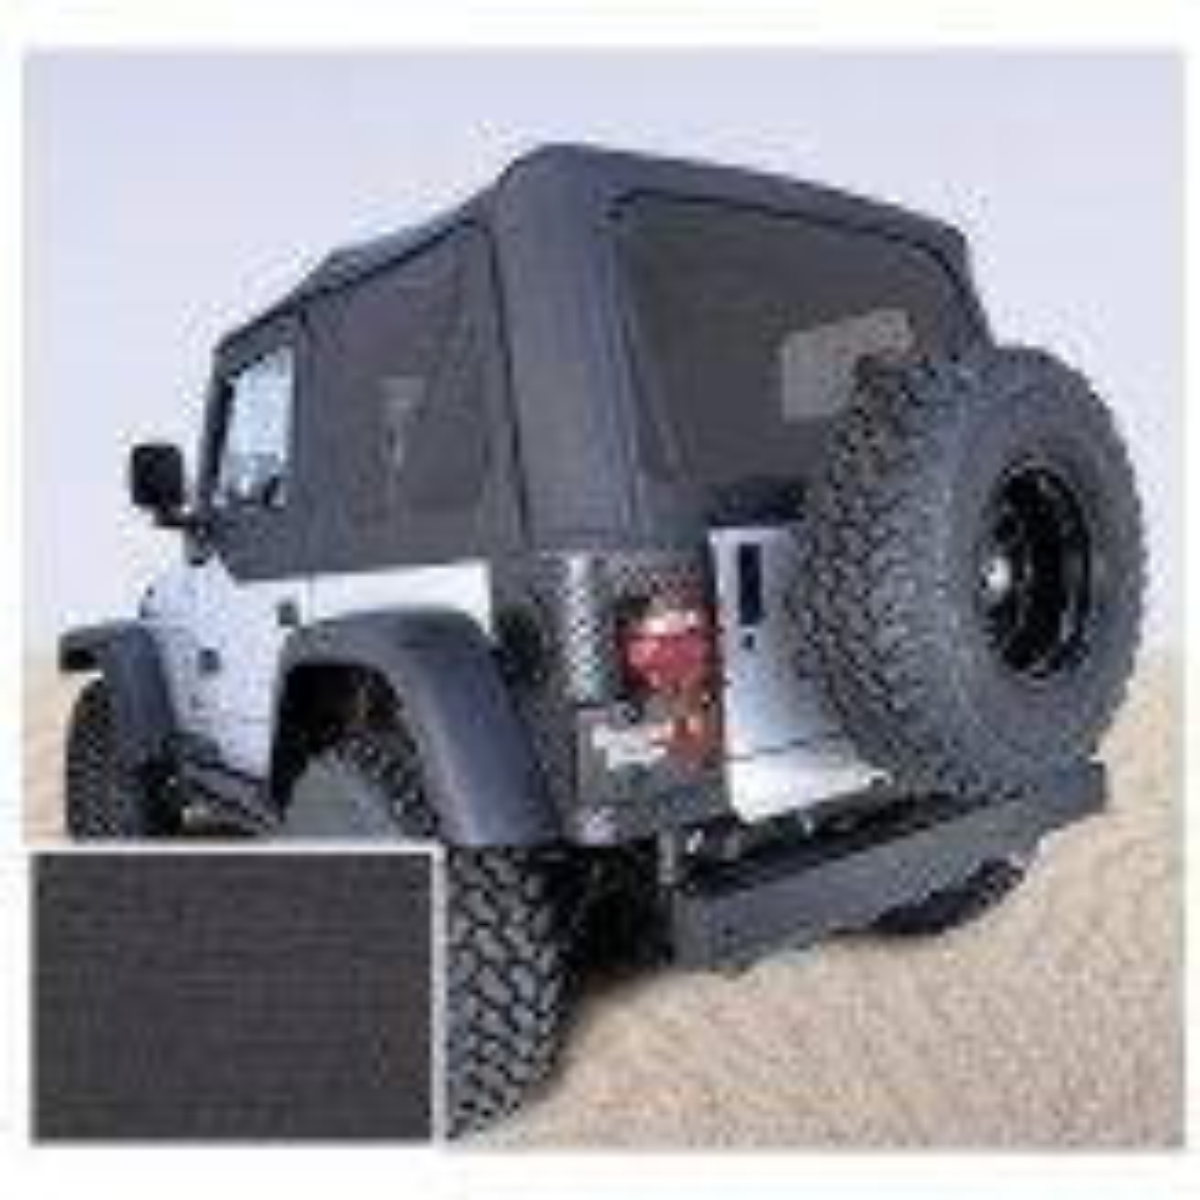 Soft Top, Door Skins, Black, Tinted Windows; 97-02 Jeep Wrangler TJ